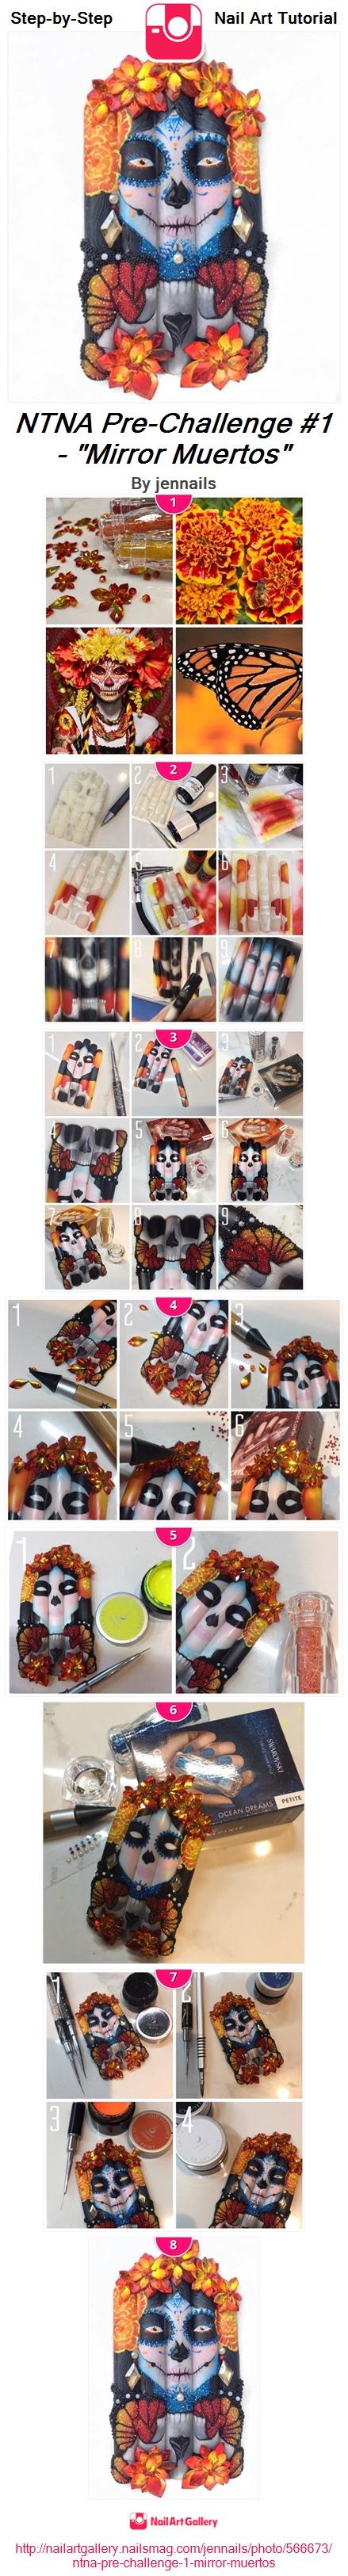 "NTNA Pre-Challenge #1 - ""Mirror Muertos"" - Nail Art Gallery"